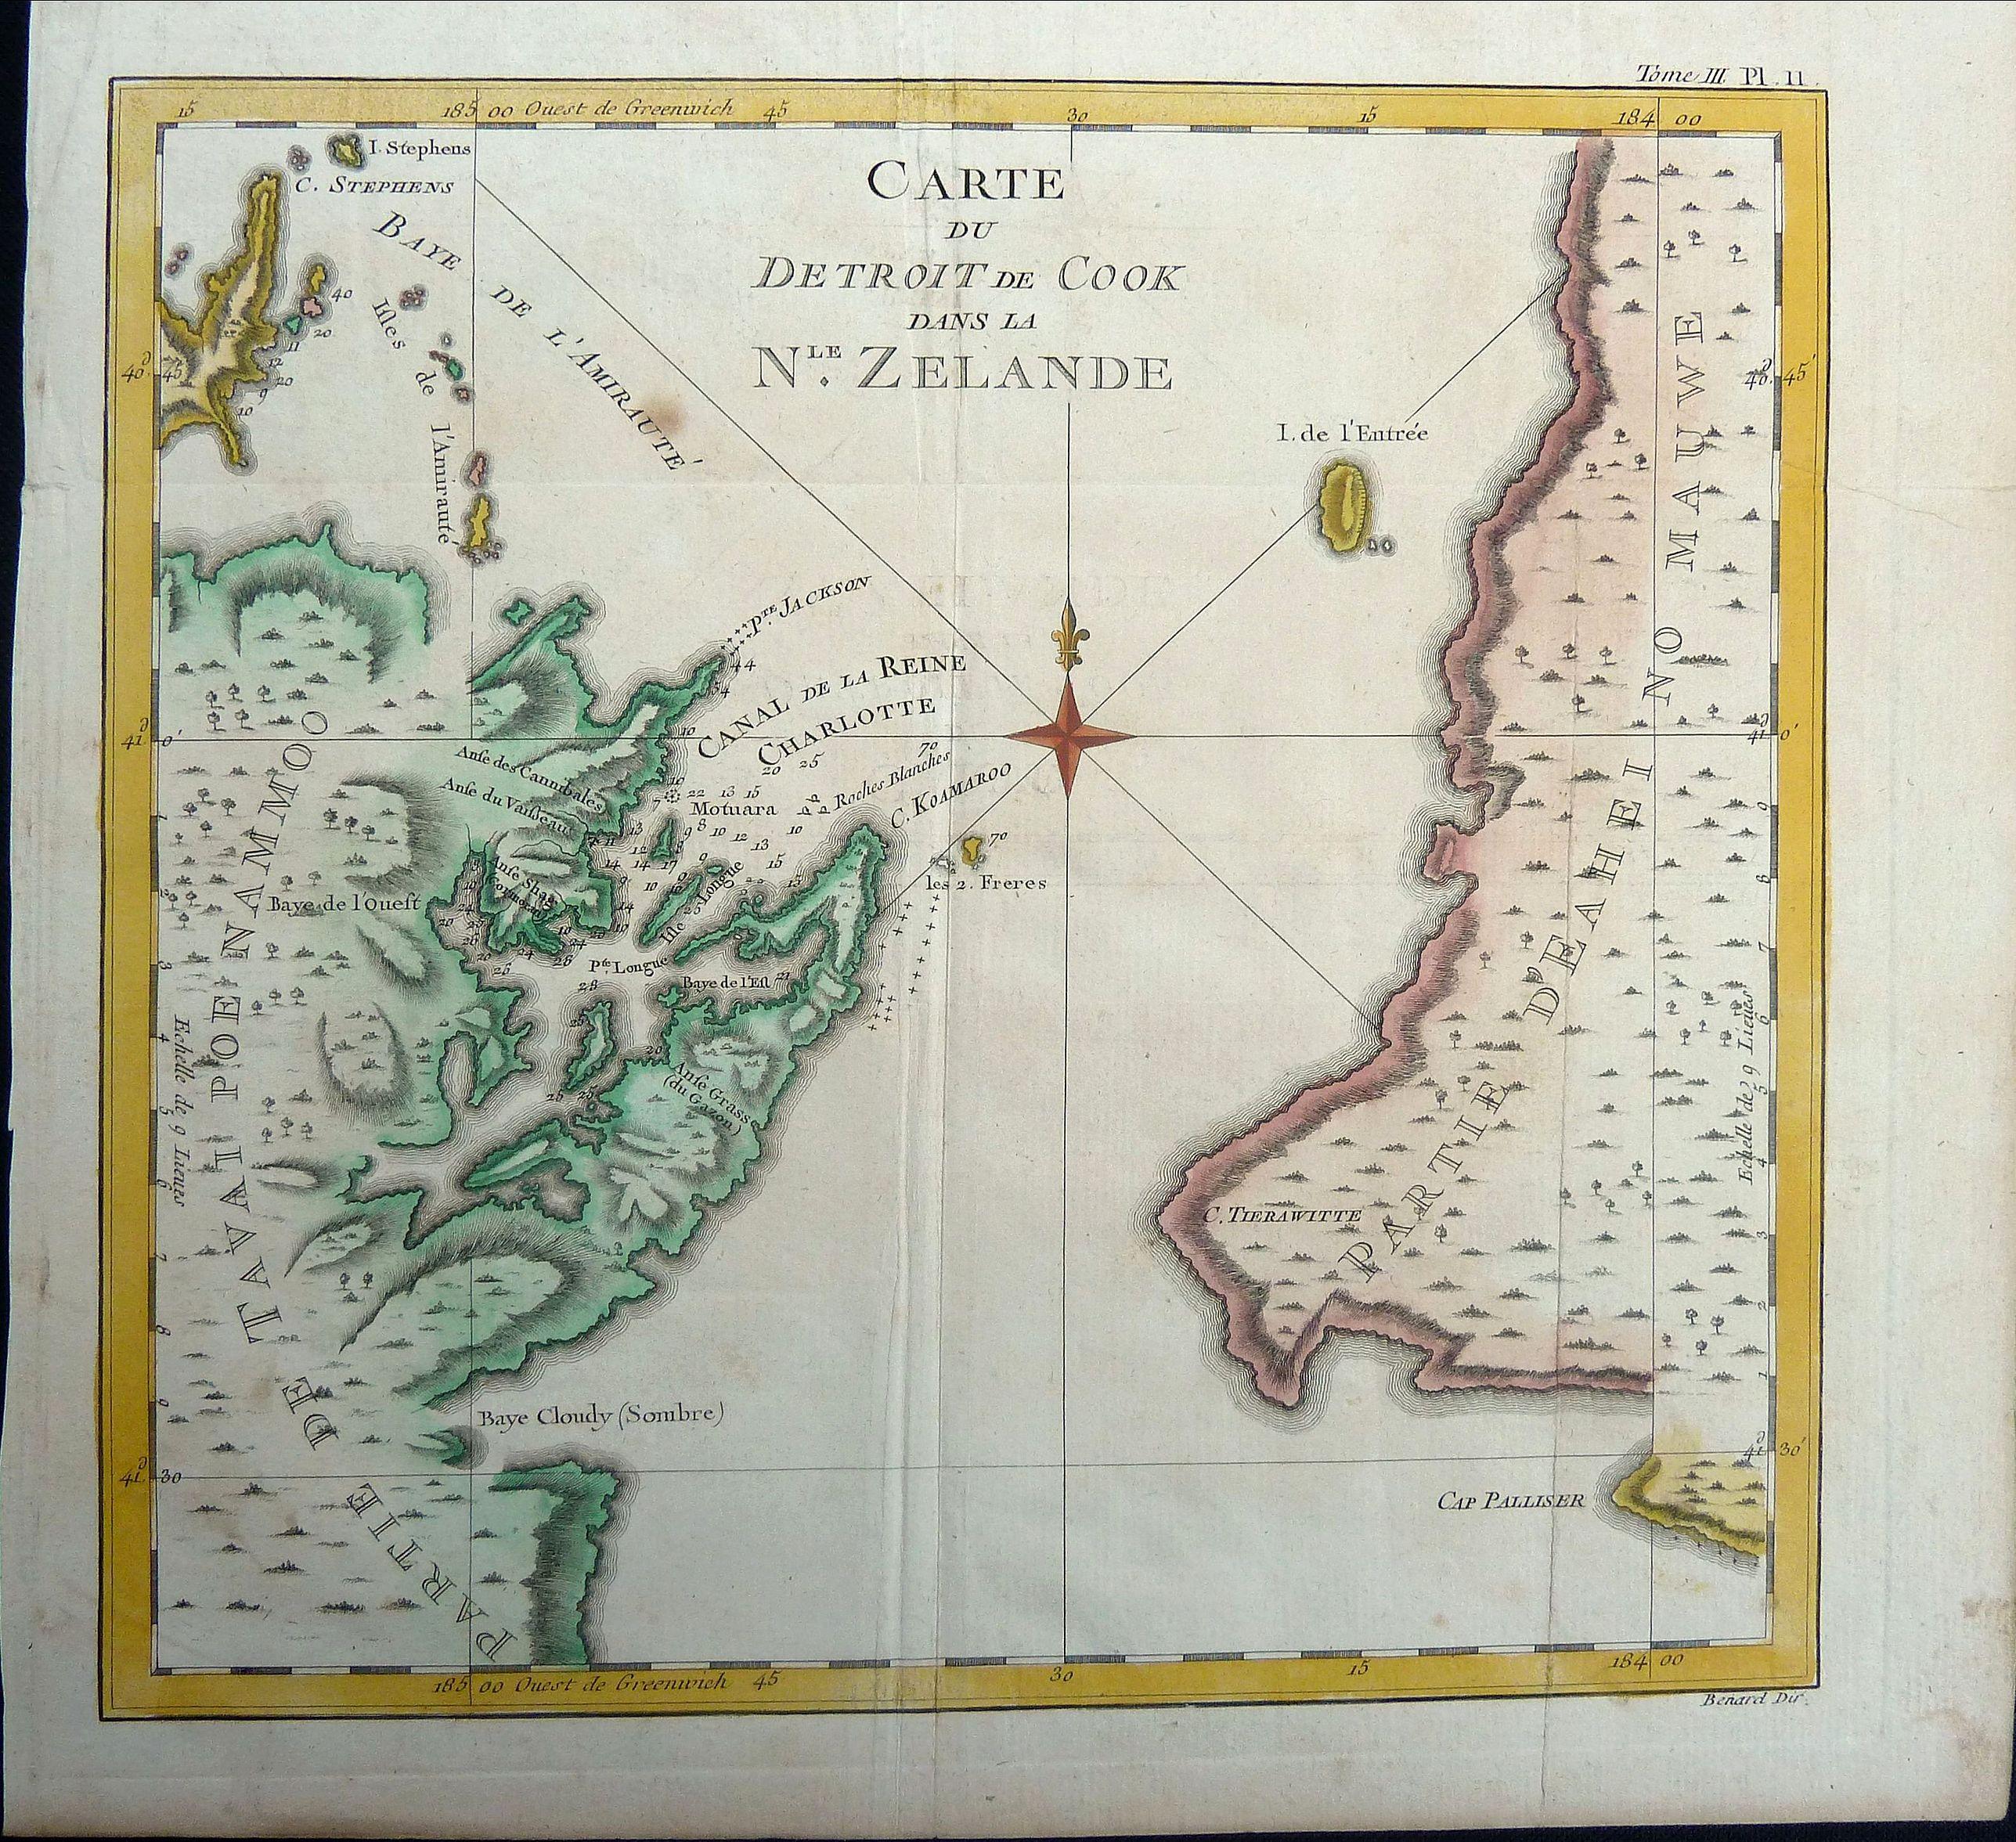 COOK, James. - Carte du Detroit de Cook dans la Nle. Zelande. Tome III Pl. 11.